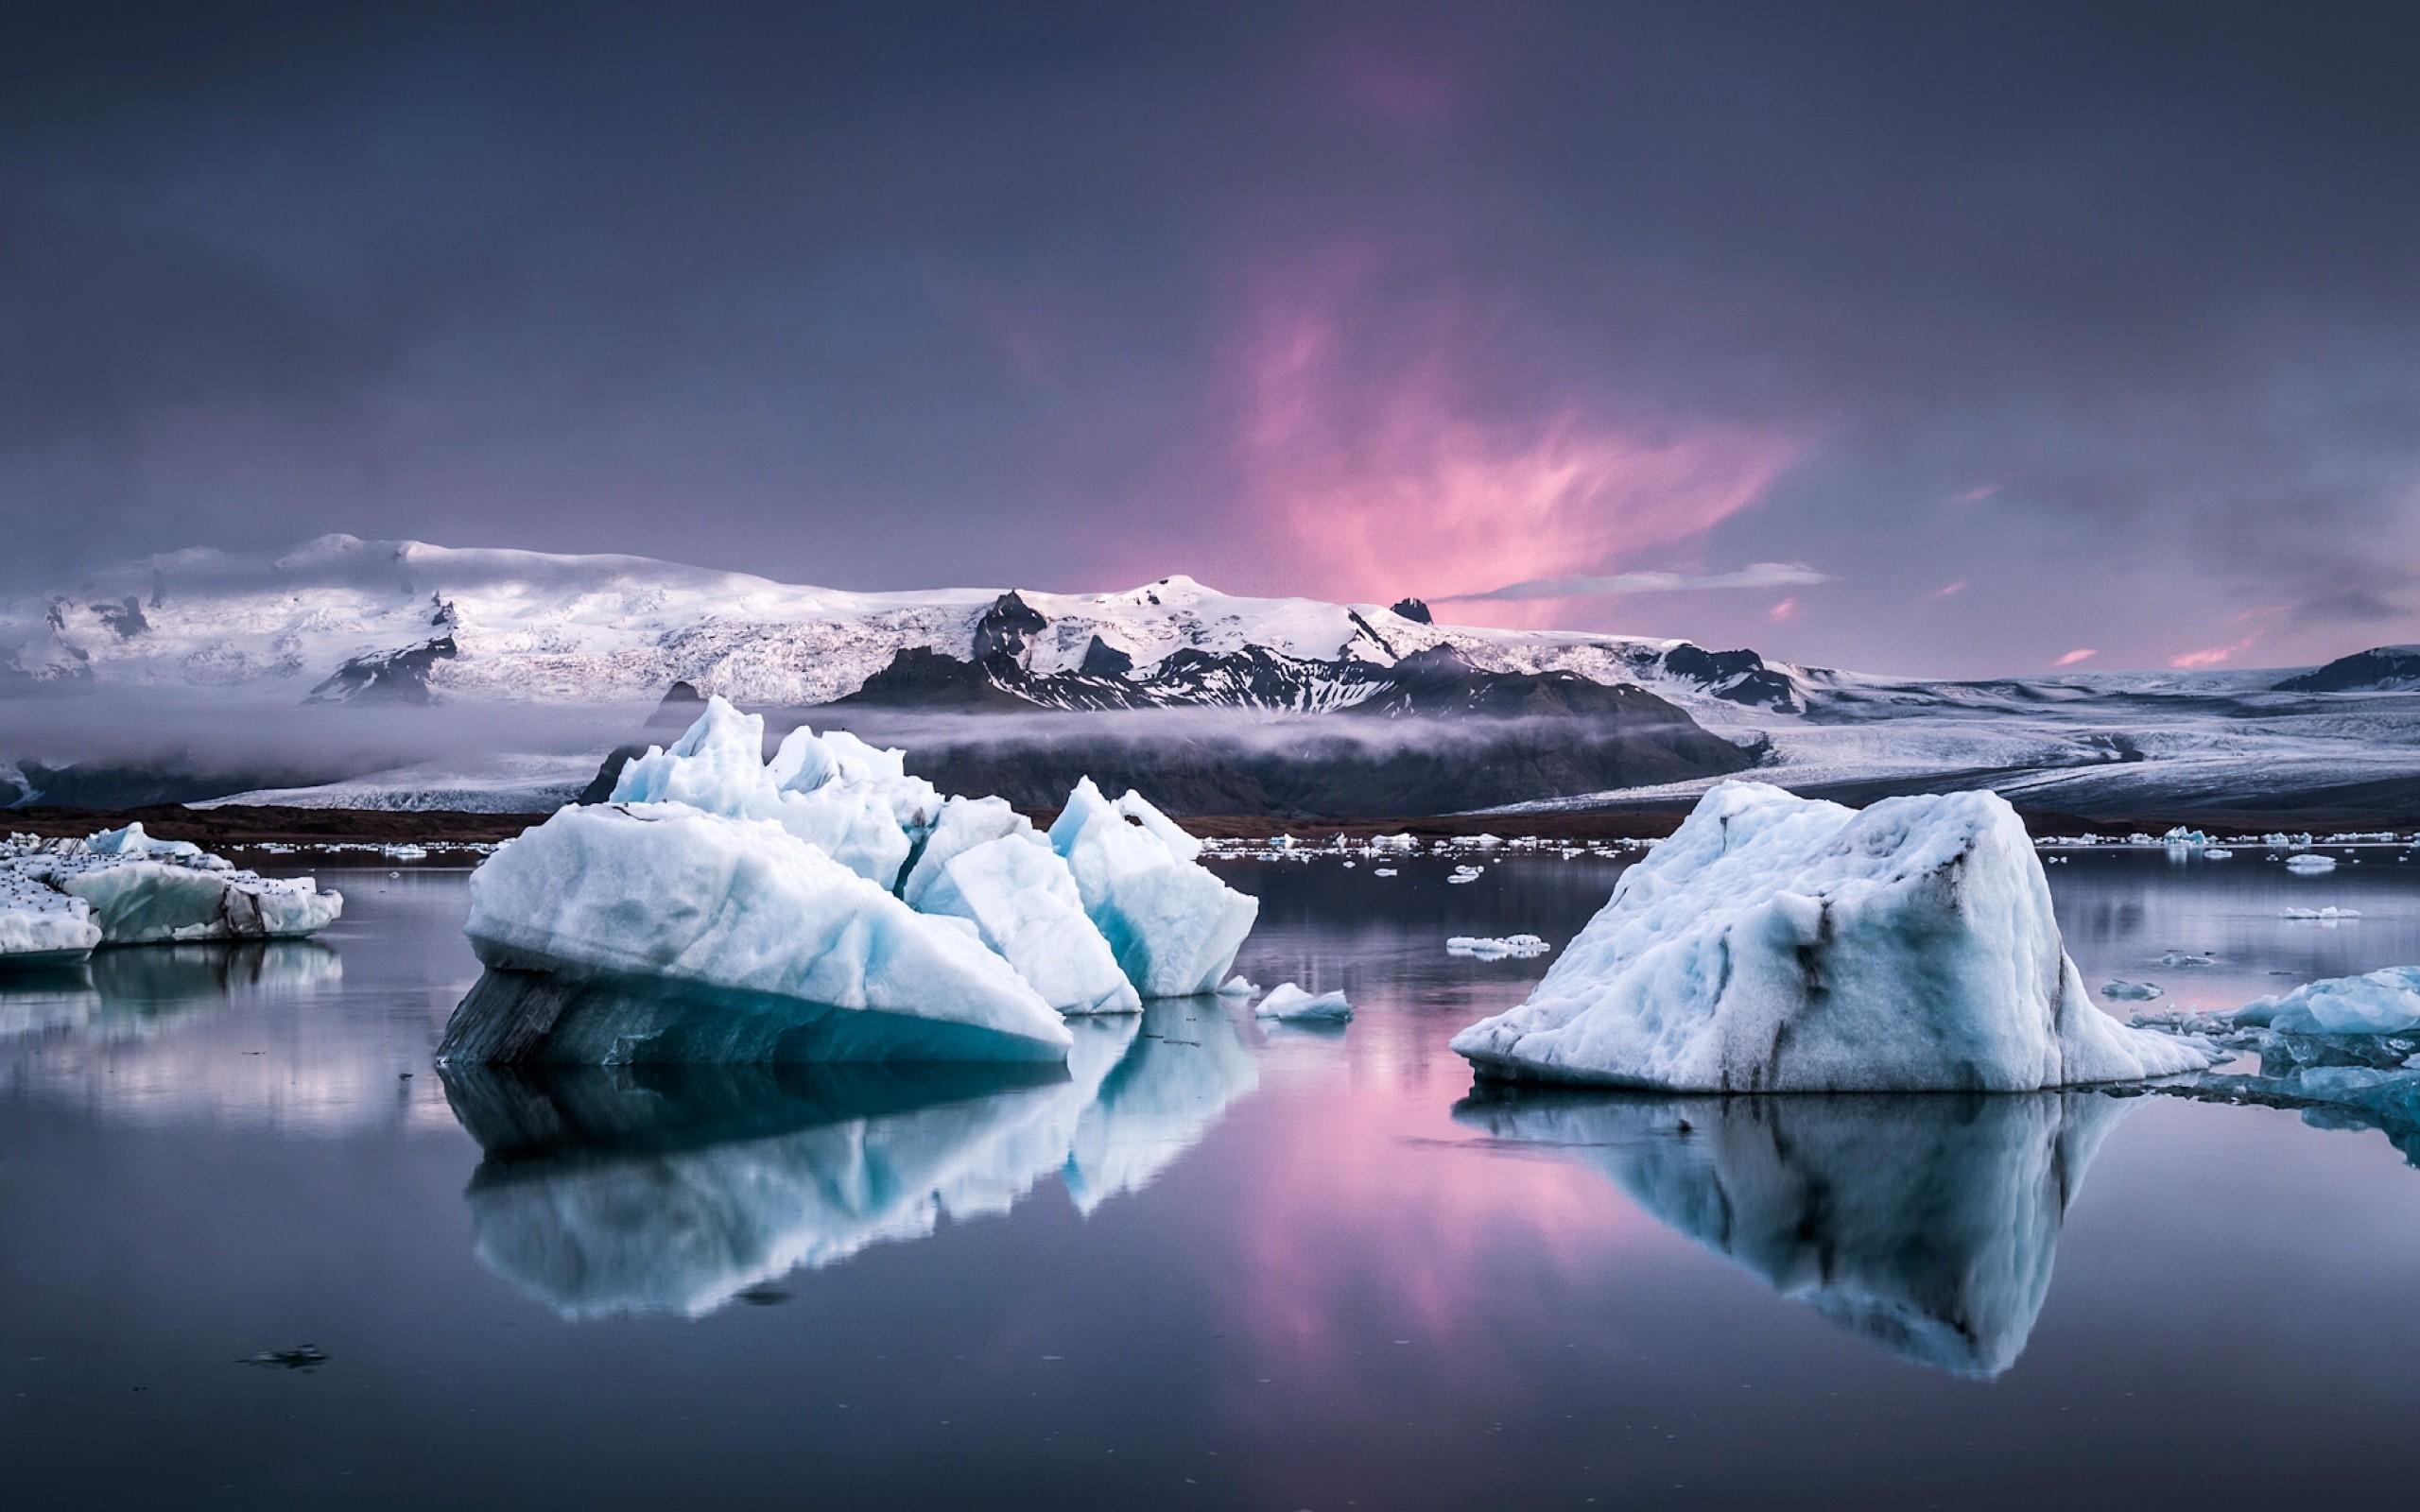 Iceland Geysers Aurora Borealis More dromocodromoco 2560x1600